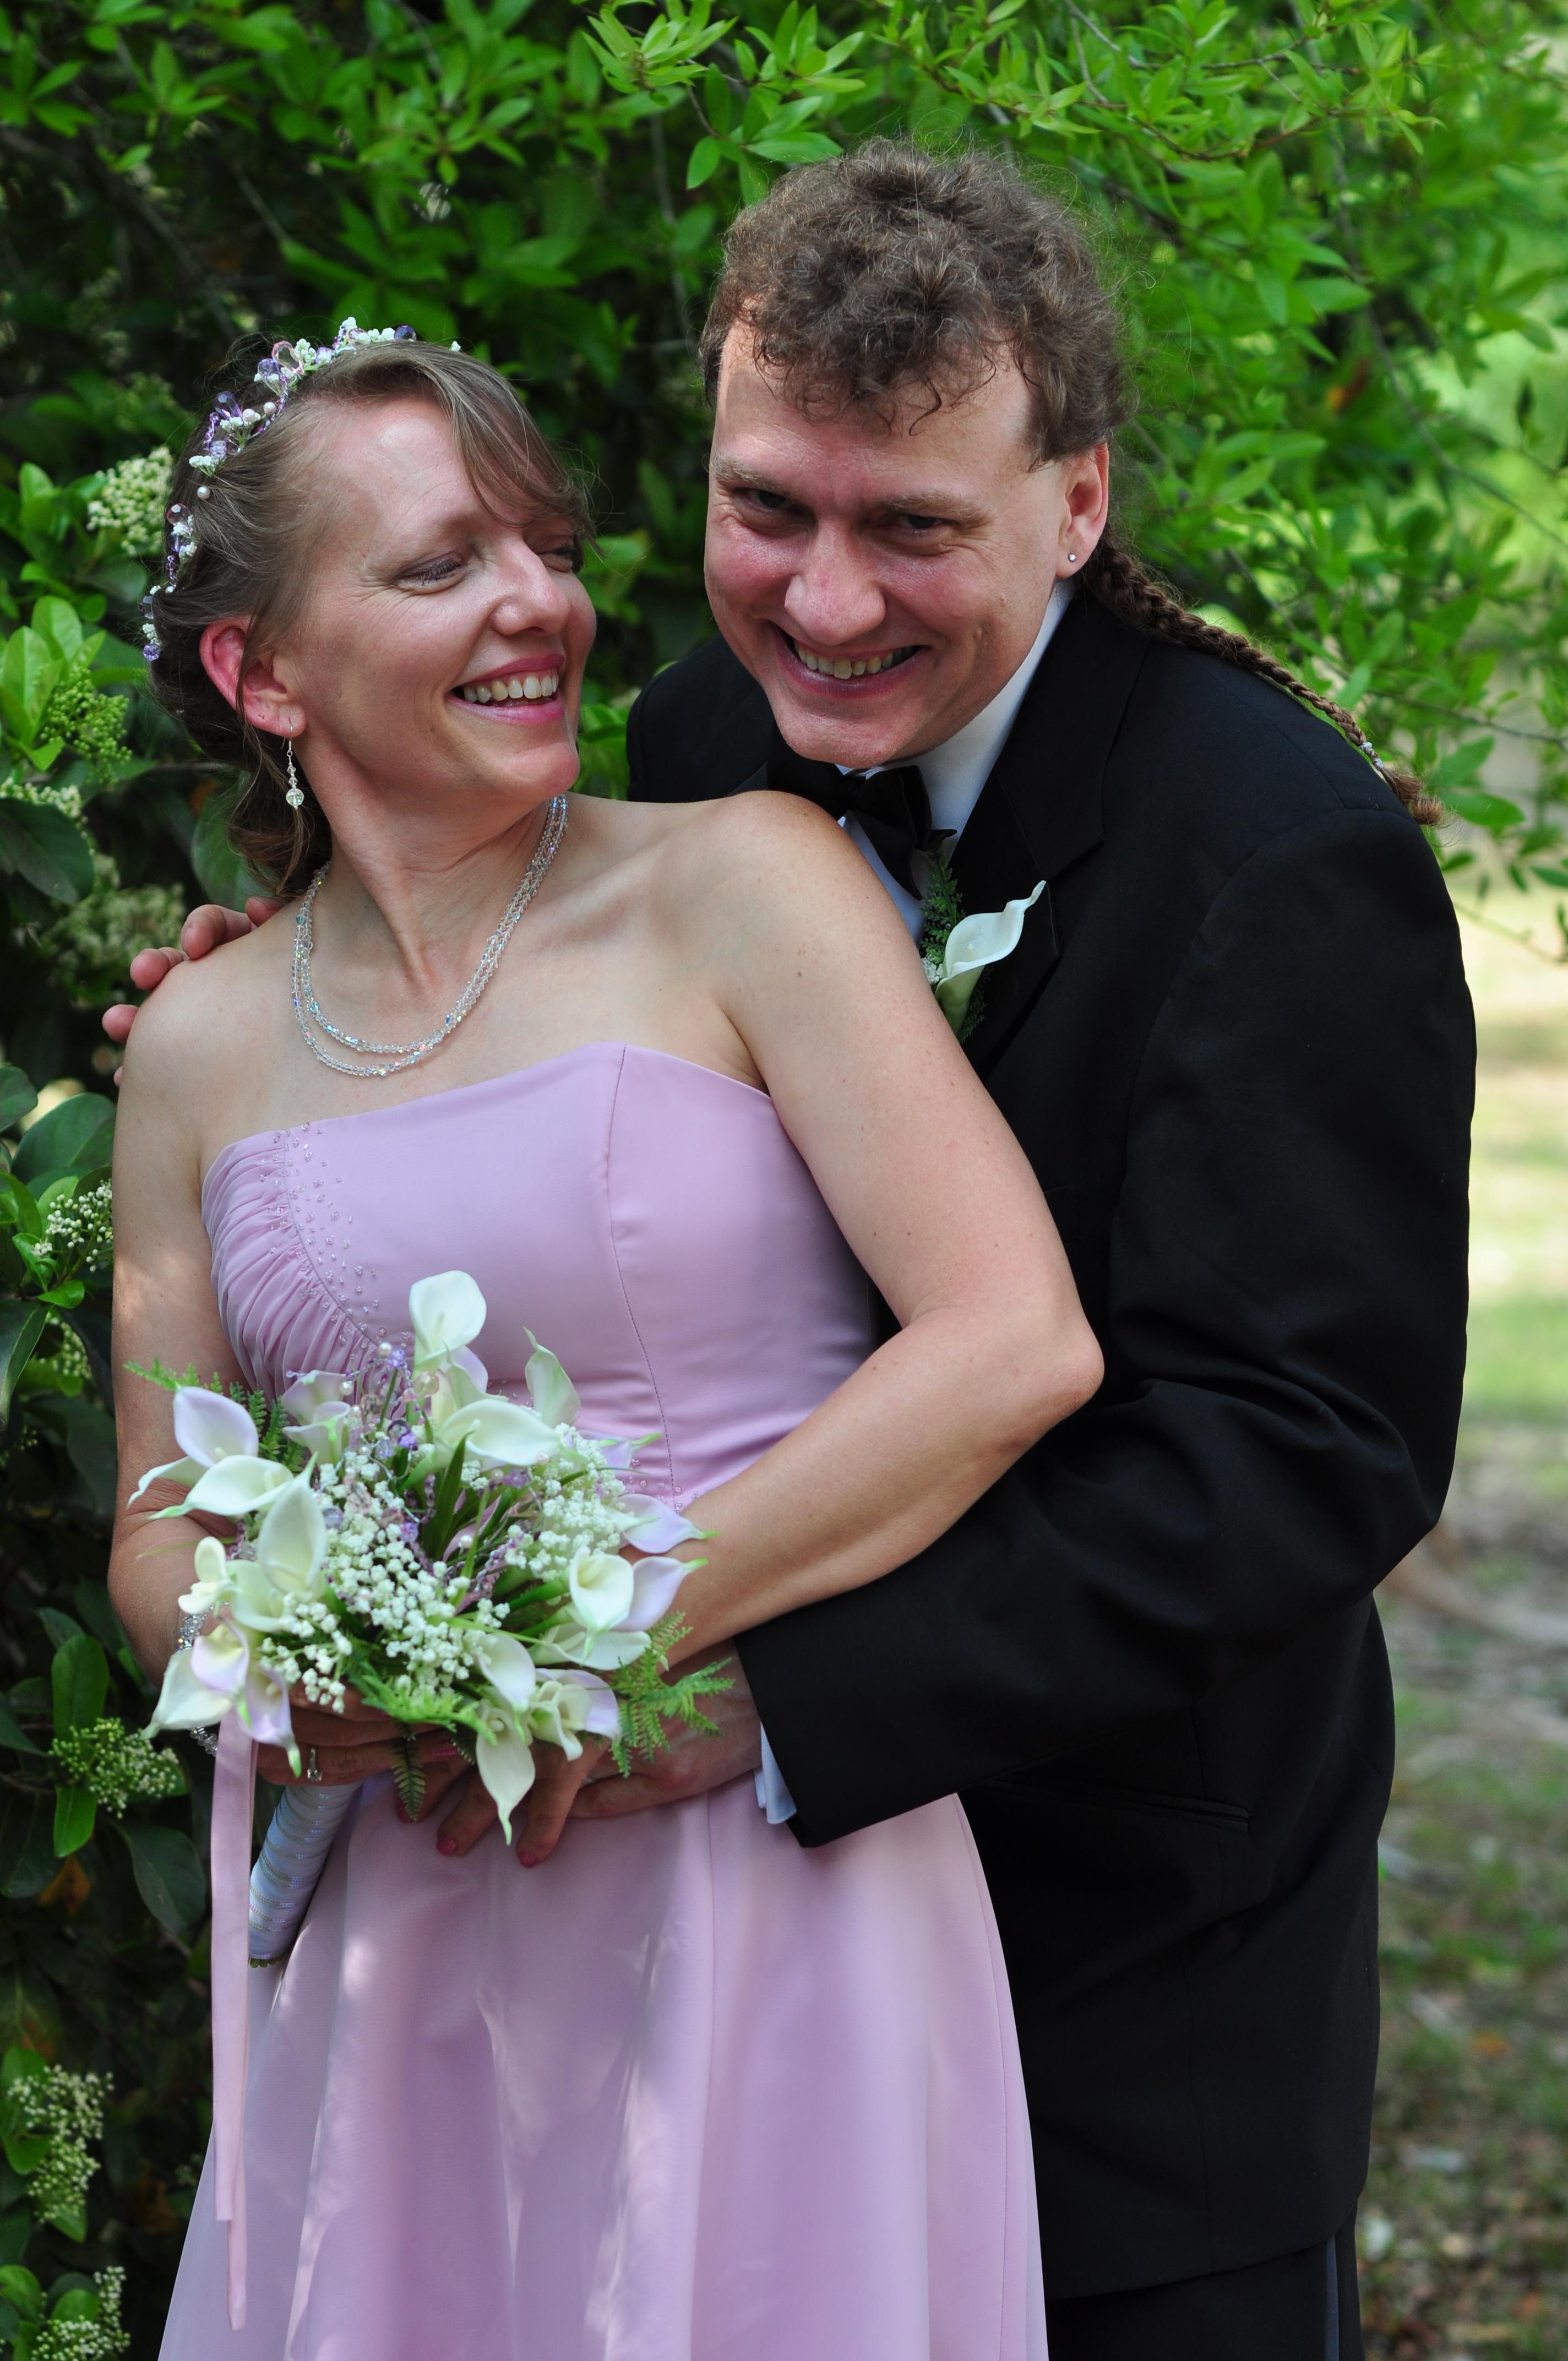 emily-and-travis-4-1-2013-april-fools-wedding-338